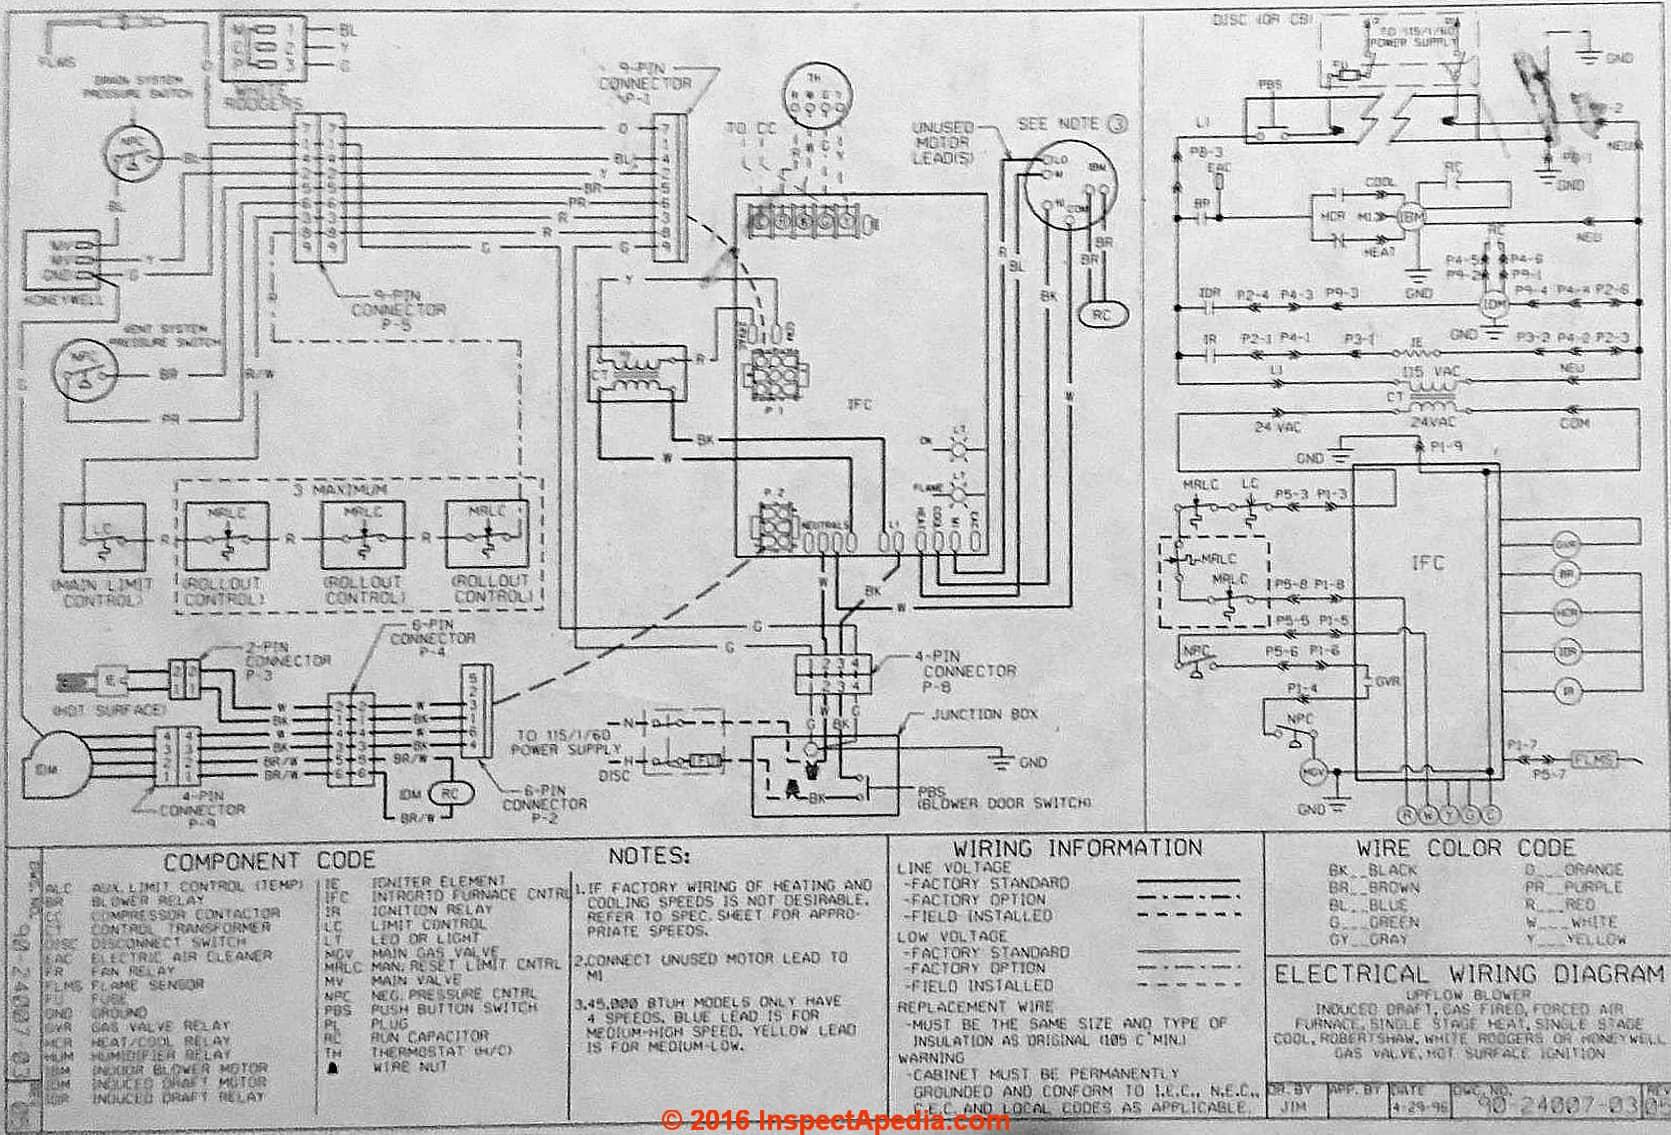 Rheem_AHU_Wiring_Diagram_IAP?resize=665%2C452&ssl=1 rheem ac unit wiring diagram wiring diagram  at sewacar.co